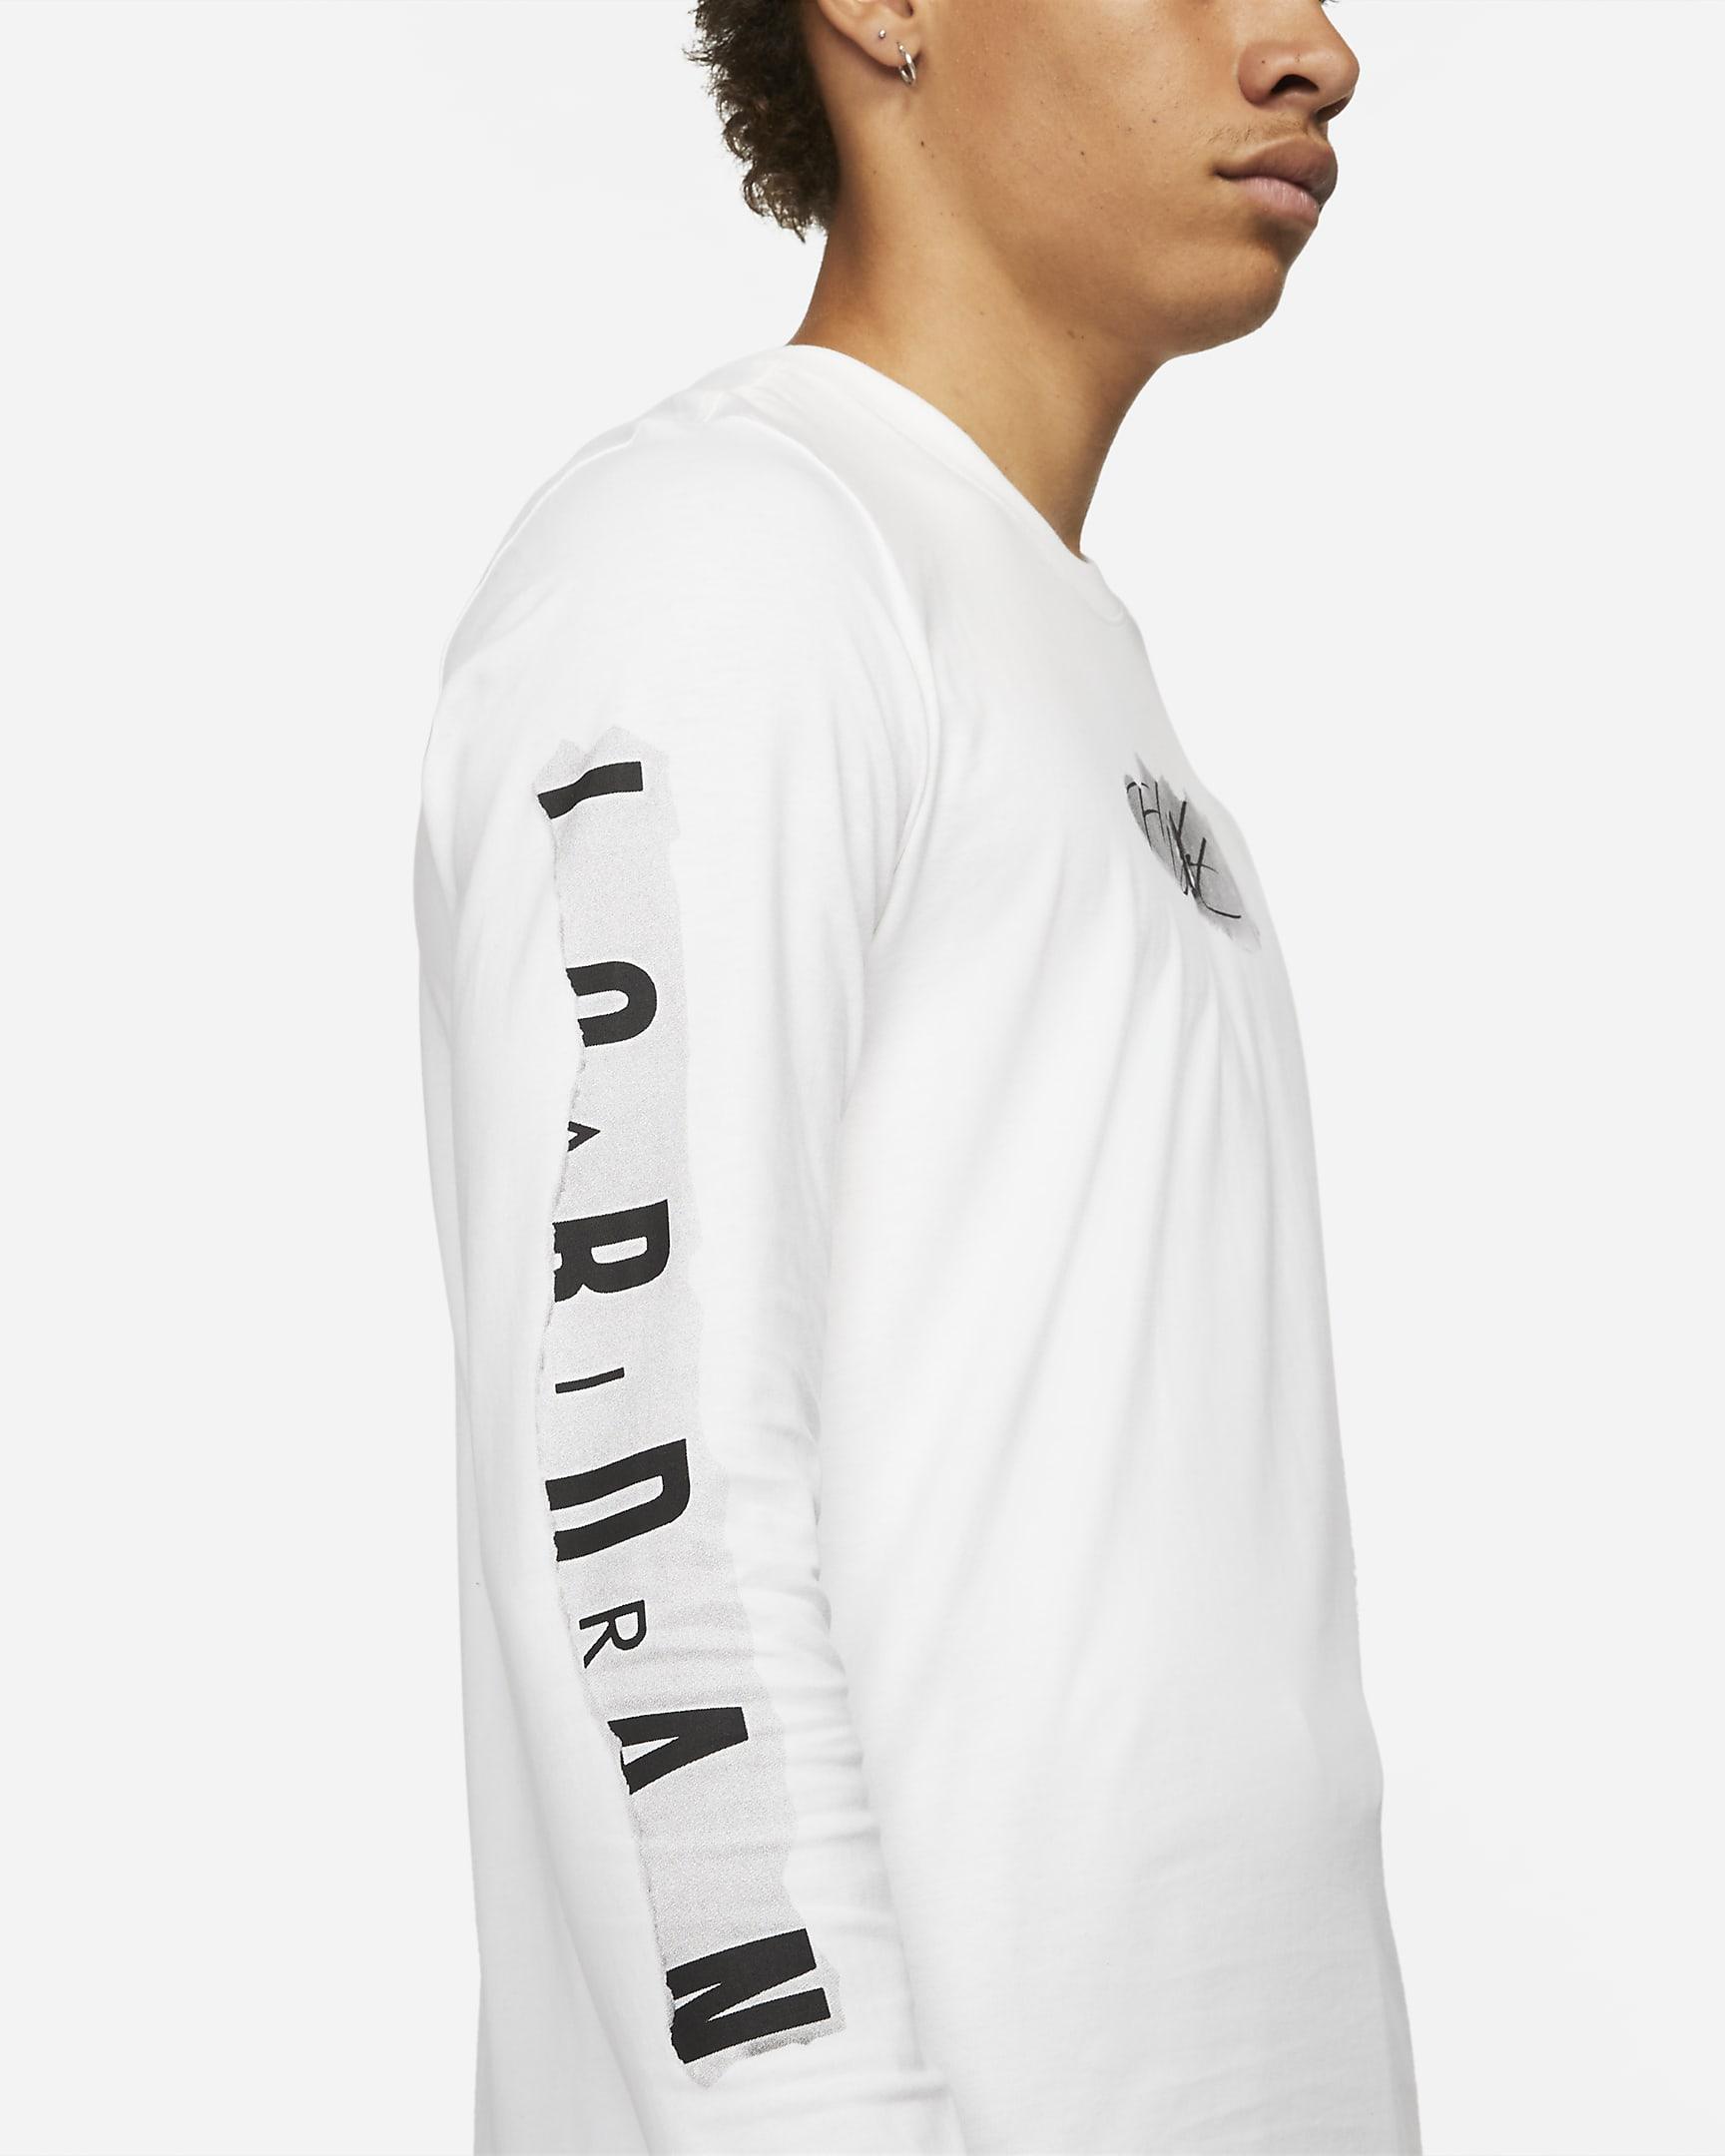 jordan-jumpman-mens-long-sleeve-t-shirt-2dMpXz-2.png